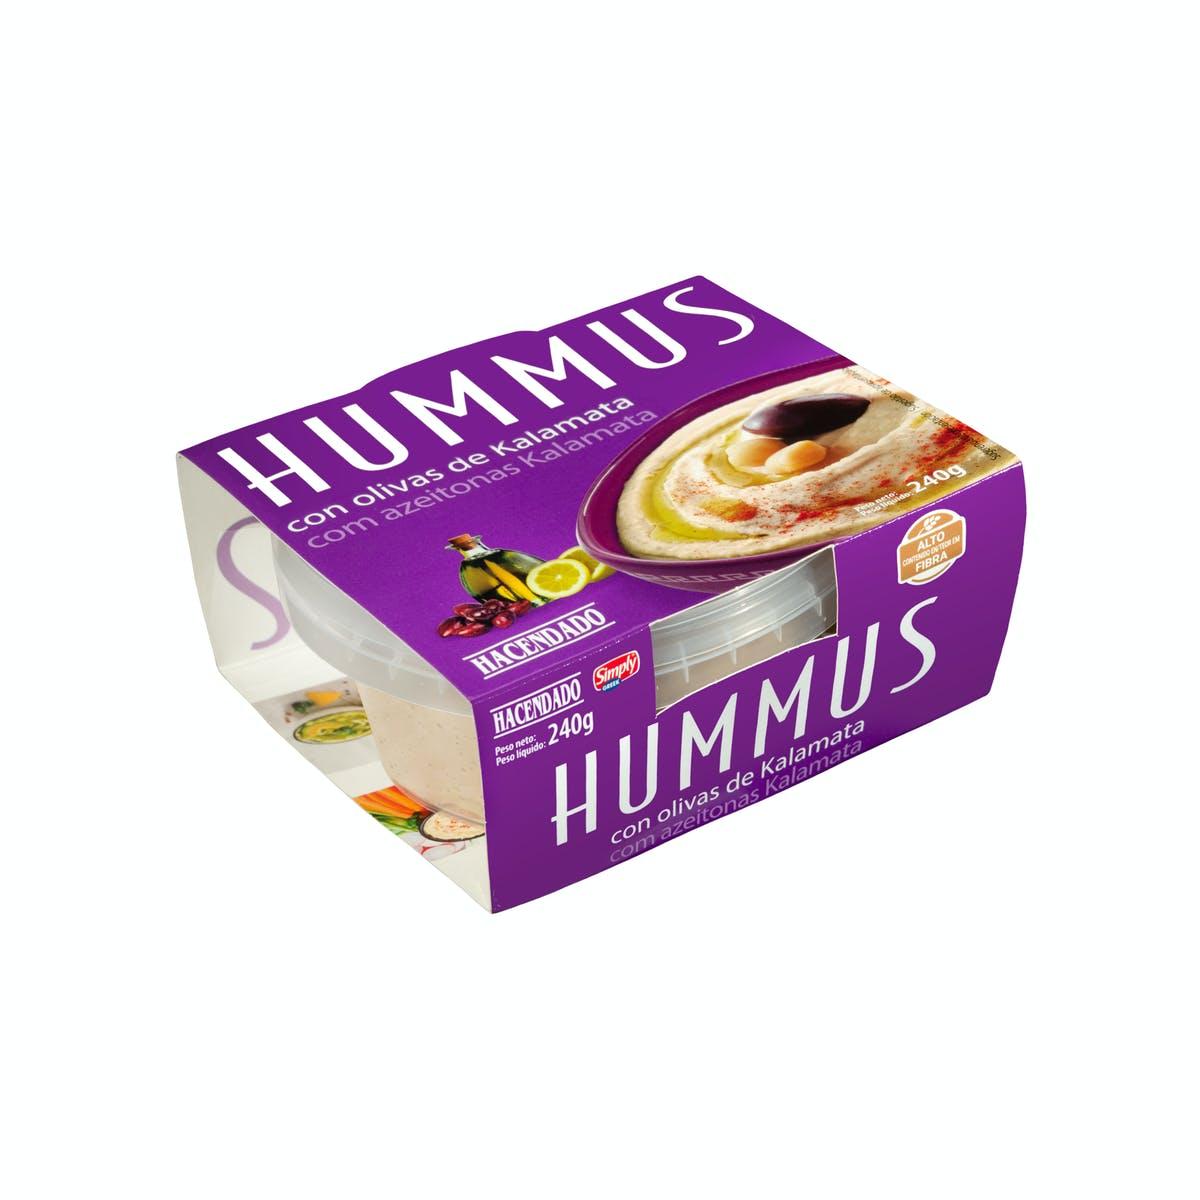 hummus-con-olivas-de-kalamata-mercadona